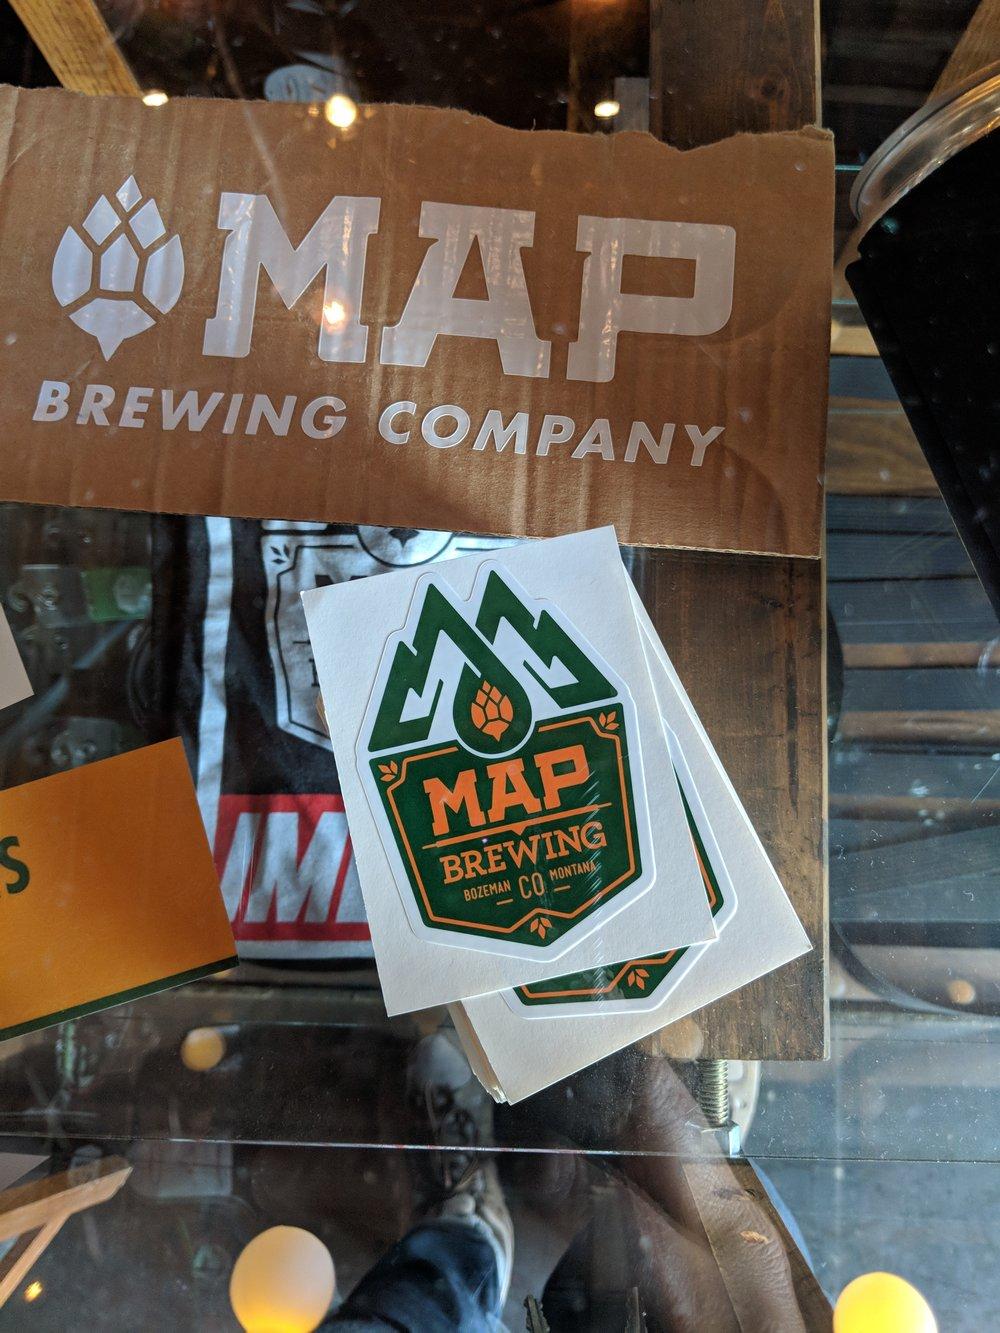 Visiting map Brewing